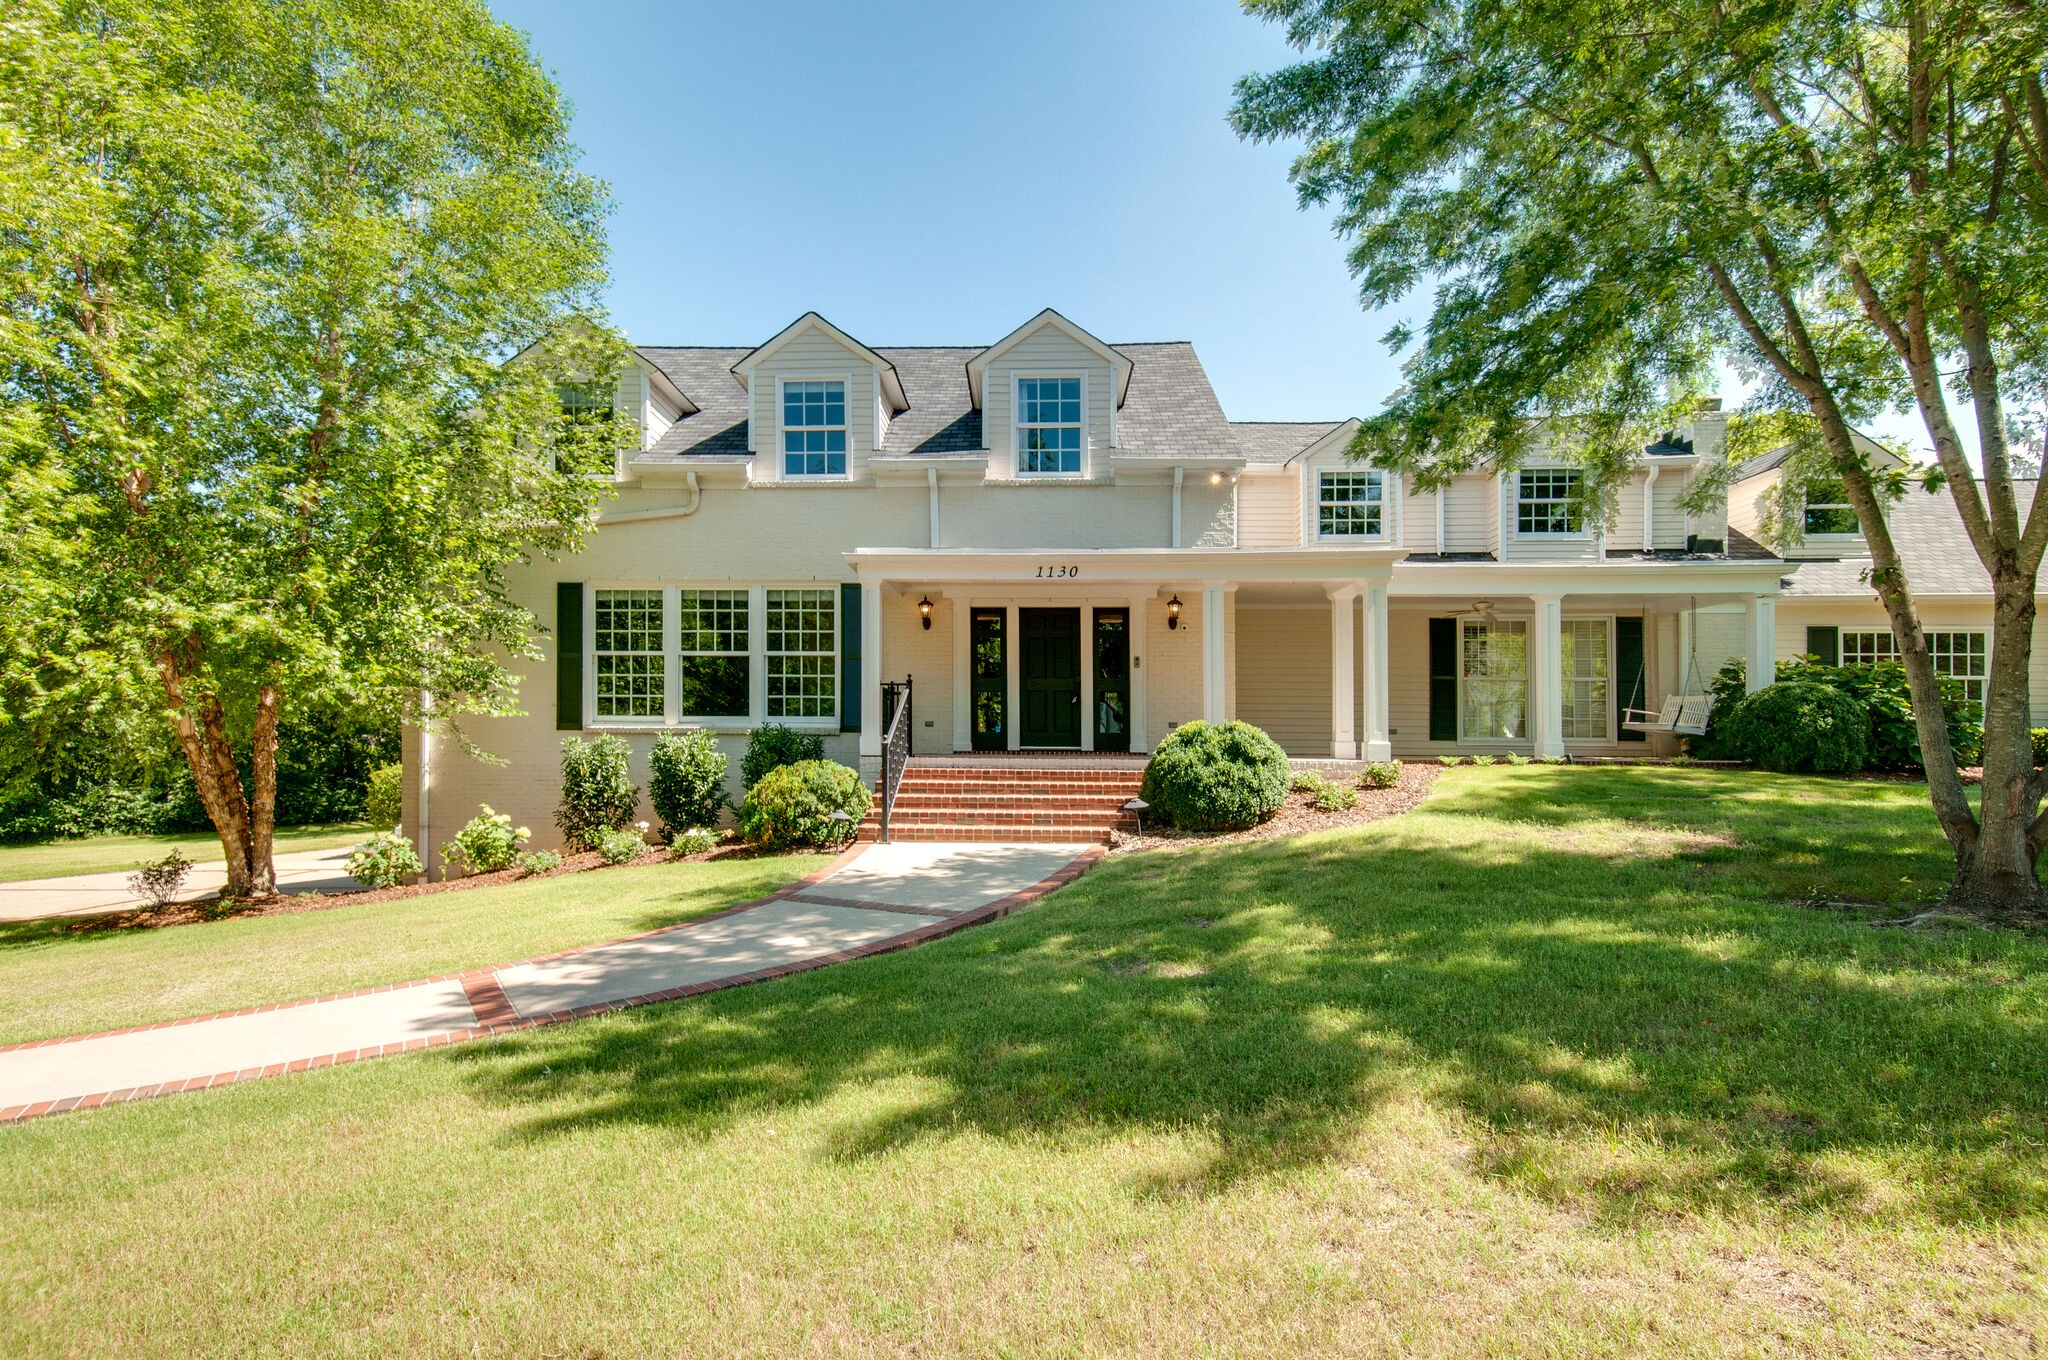 1130 Brookwood Ln Property Photo - Nashville, TN real estate listing